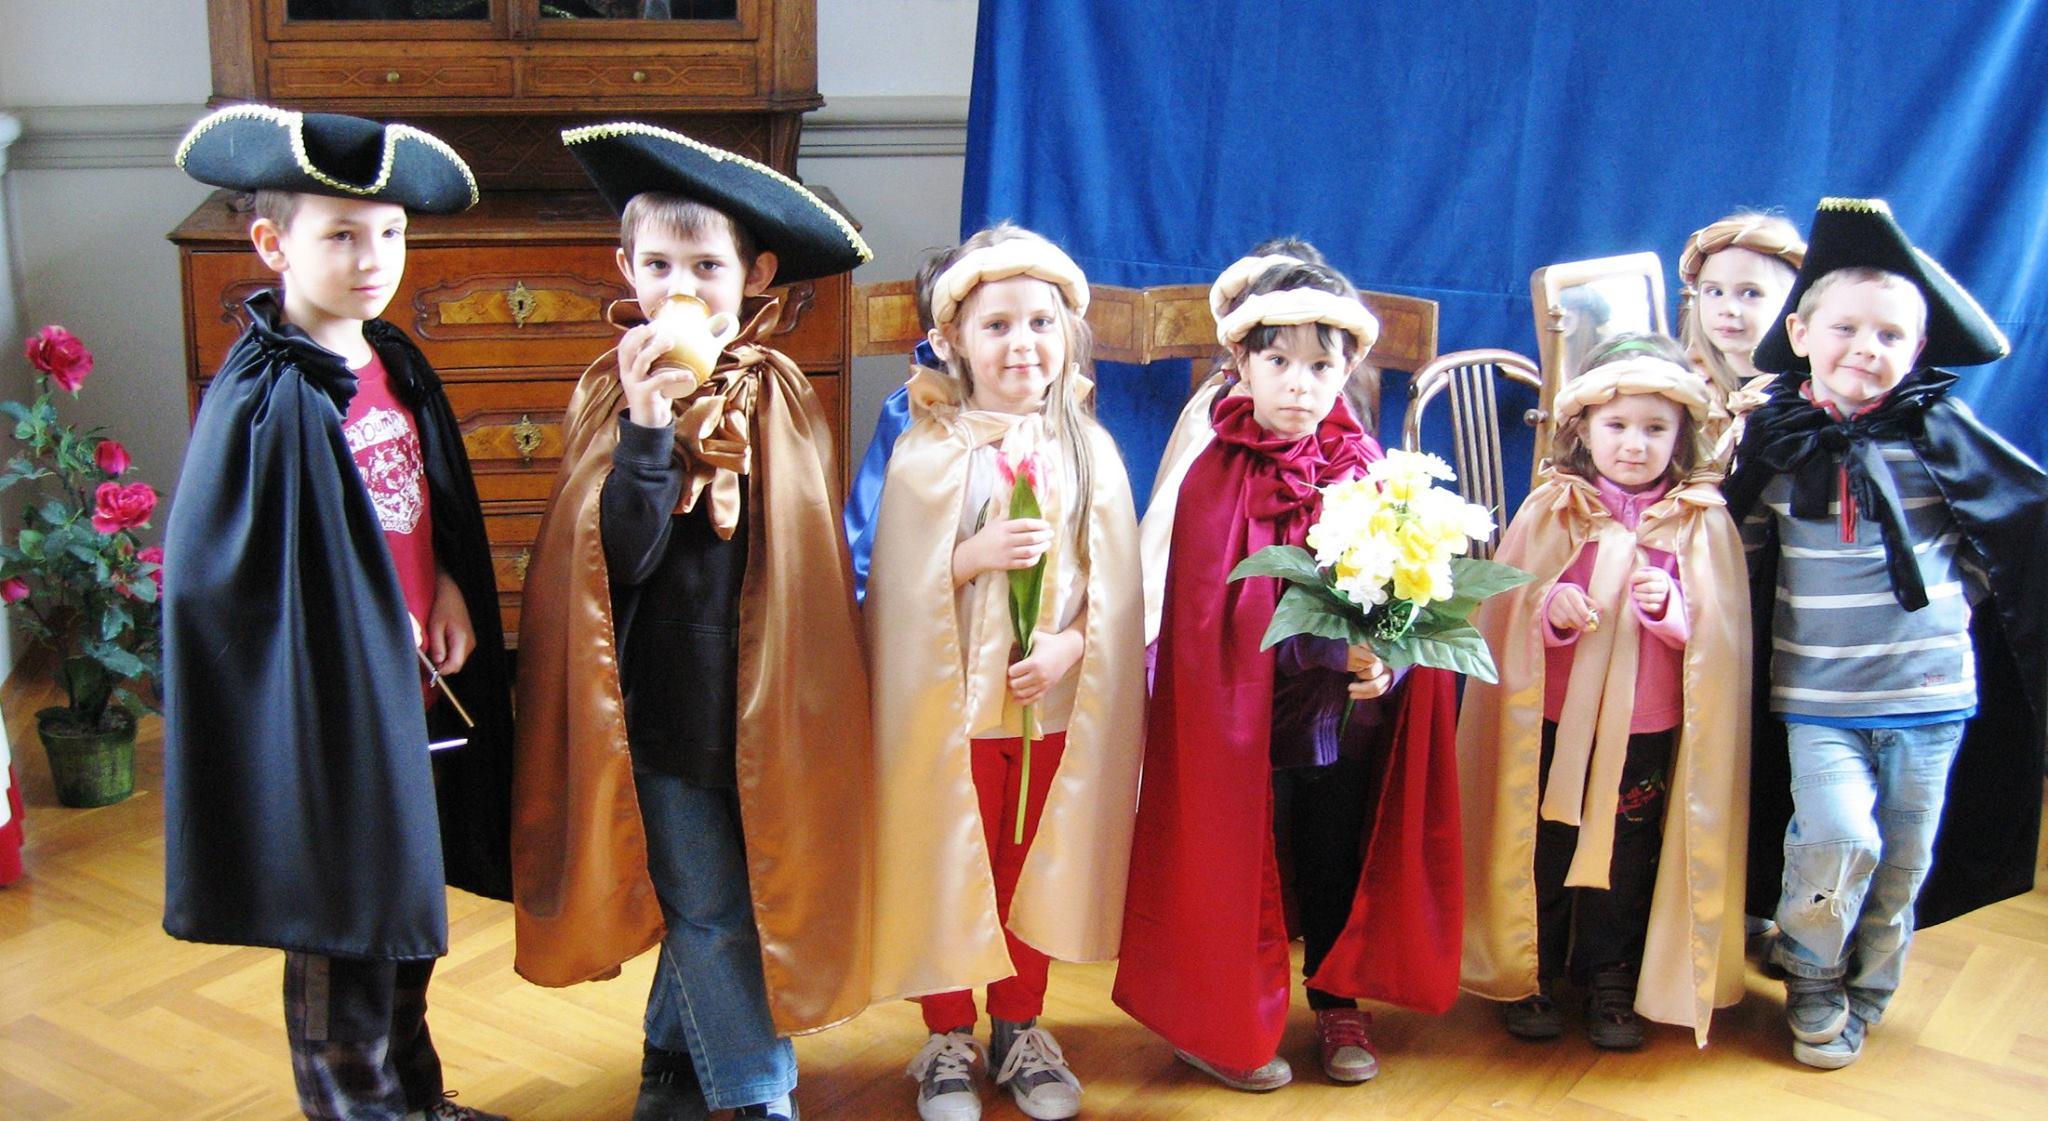 Children dressed in period costumes